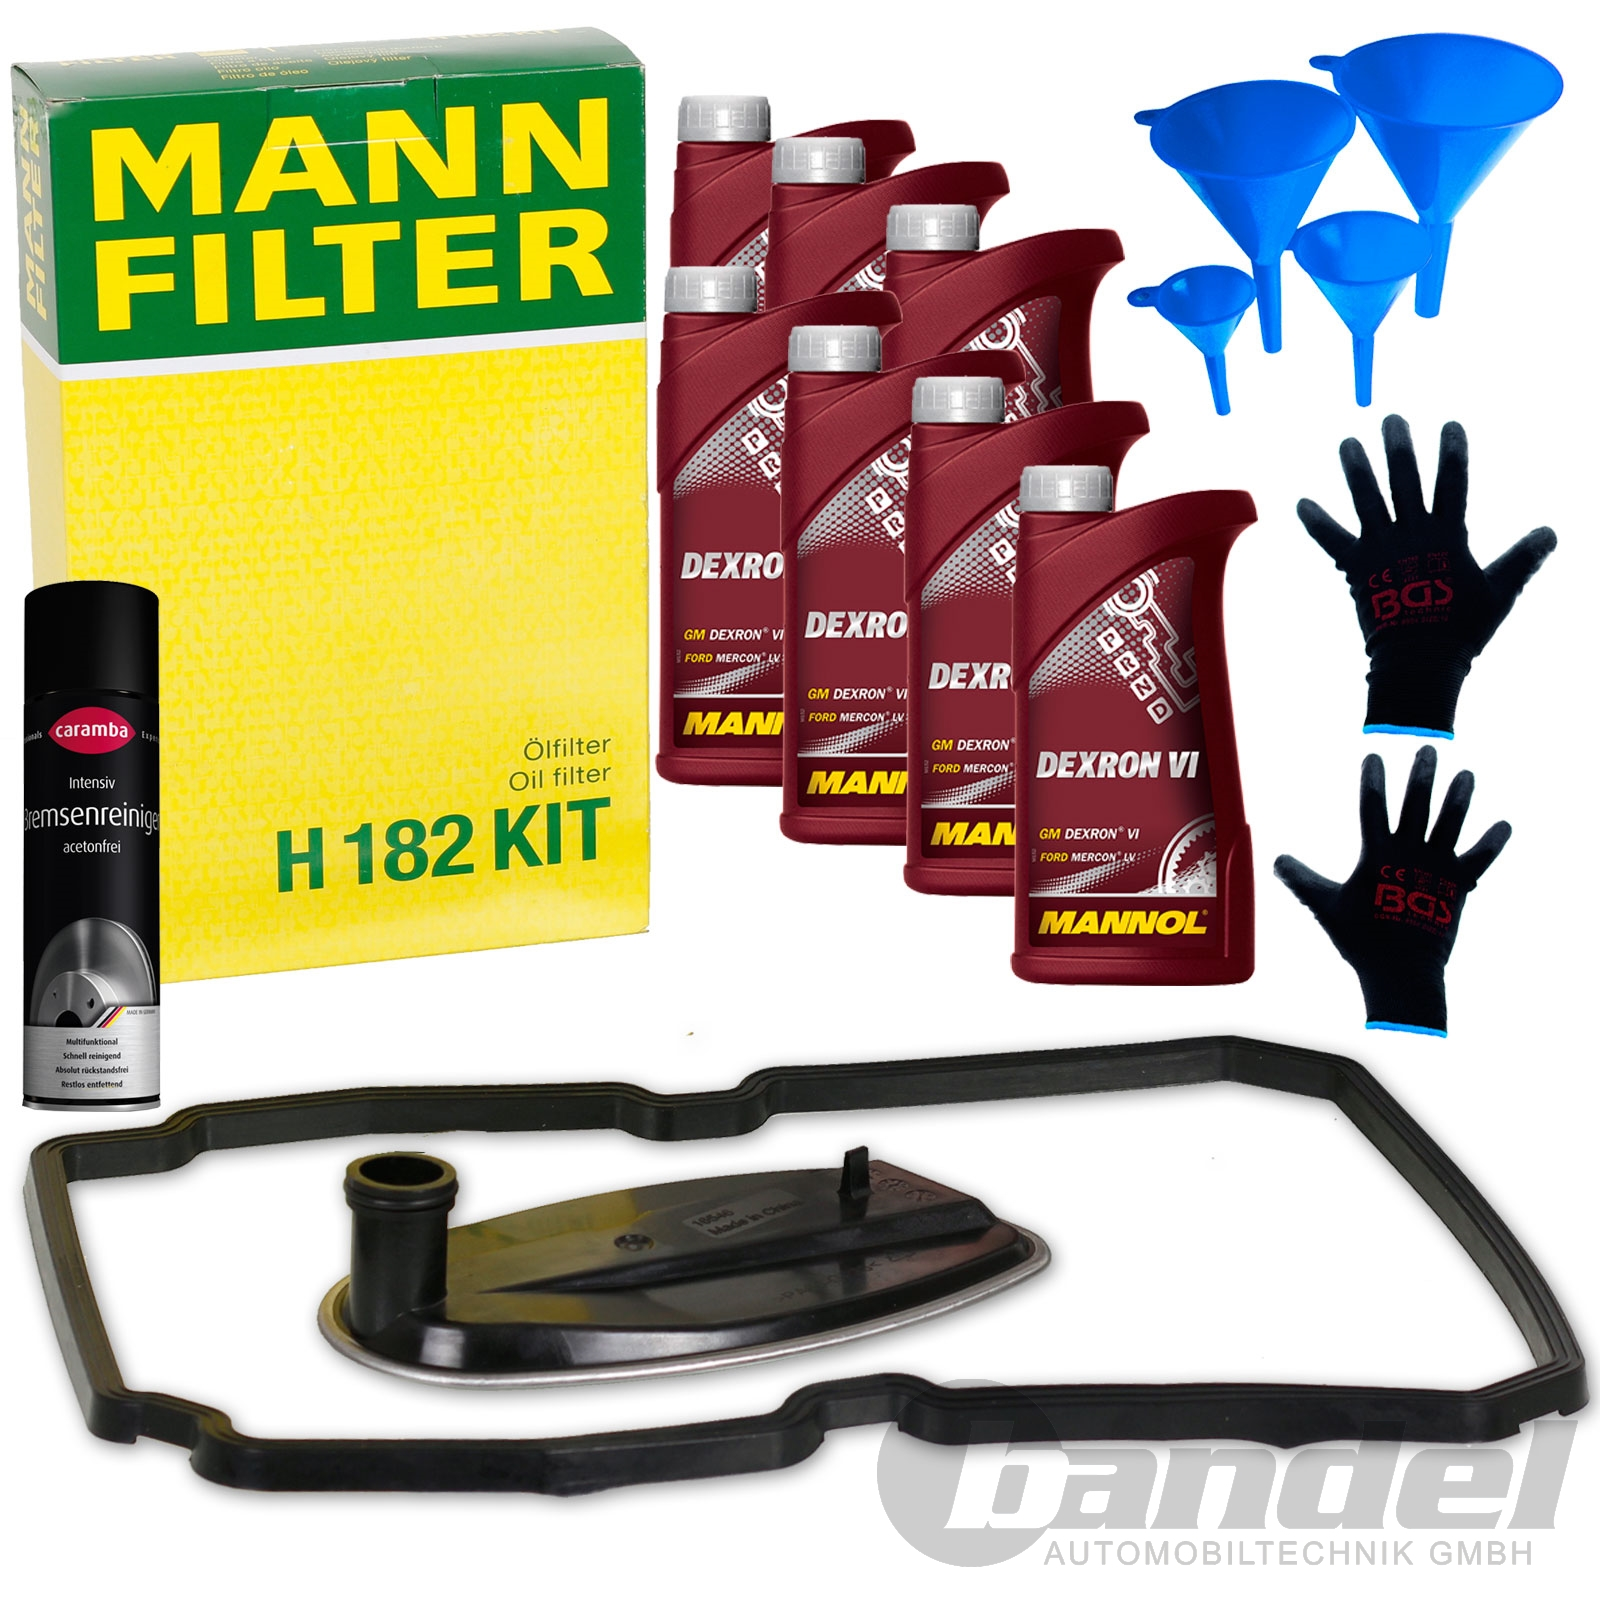 1x FEBI Ölfilter Automatikgetriebe Mercedes C E S Klasse CLC CLK